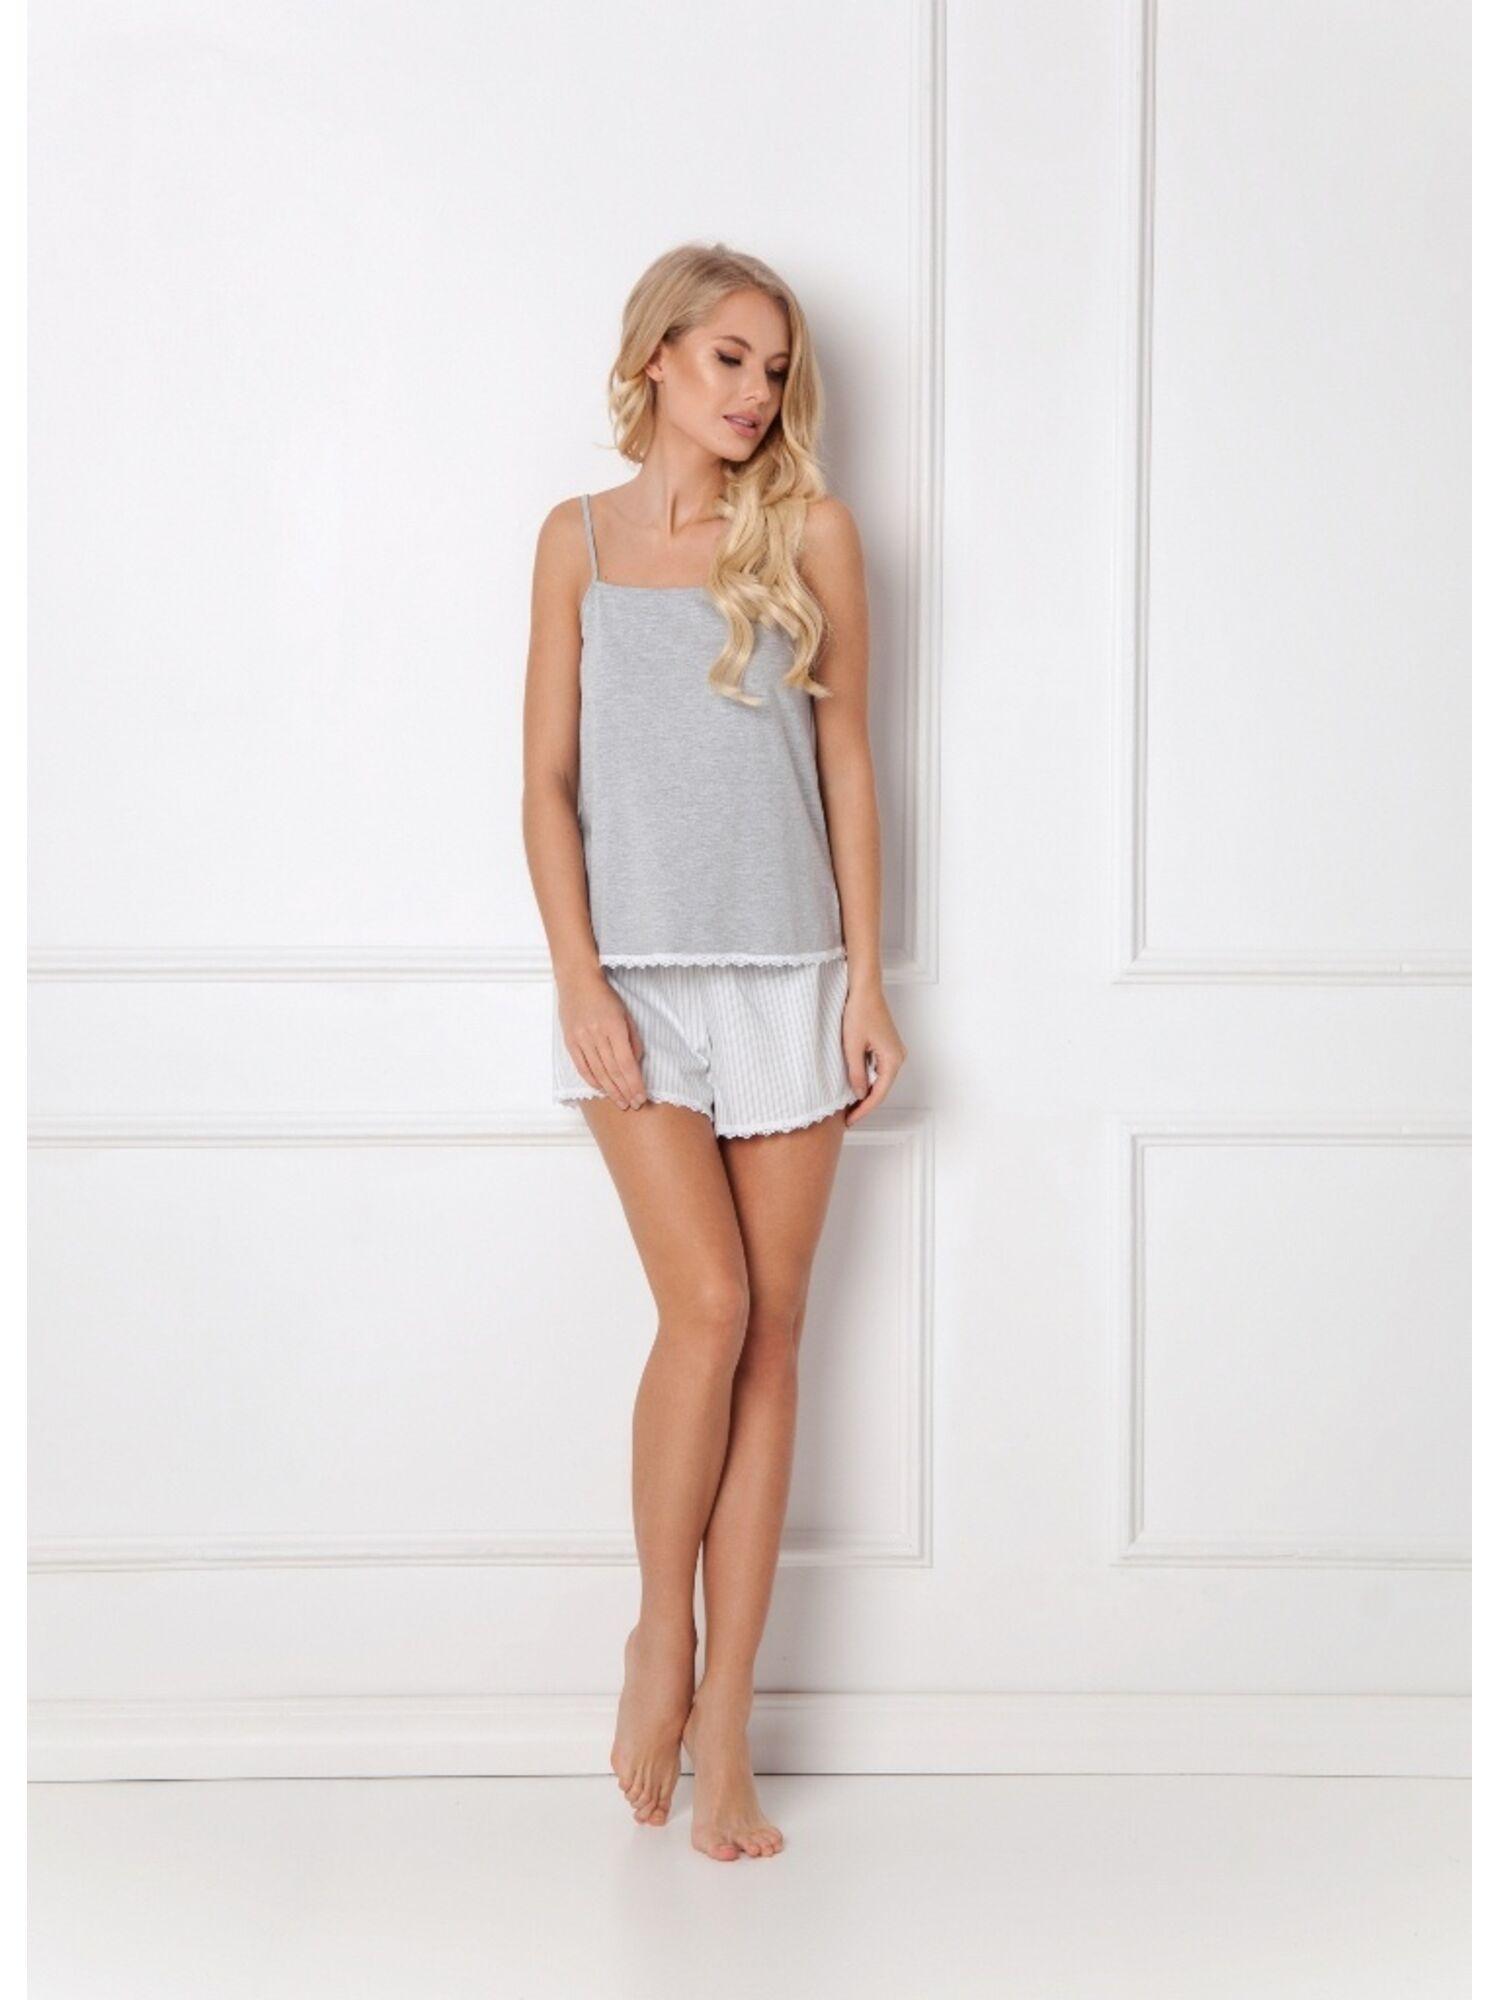 Пижама женская с шортами ADELIDE GREY, серый, ARUELLE